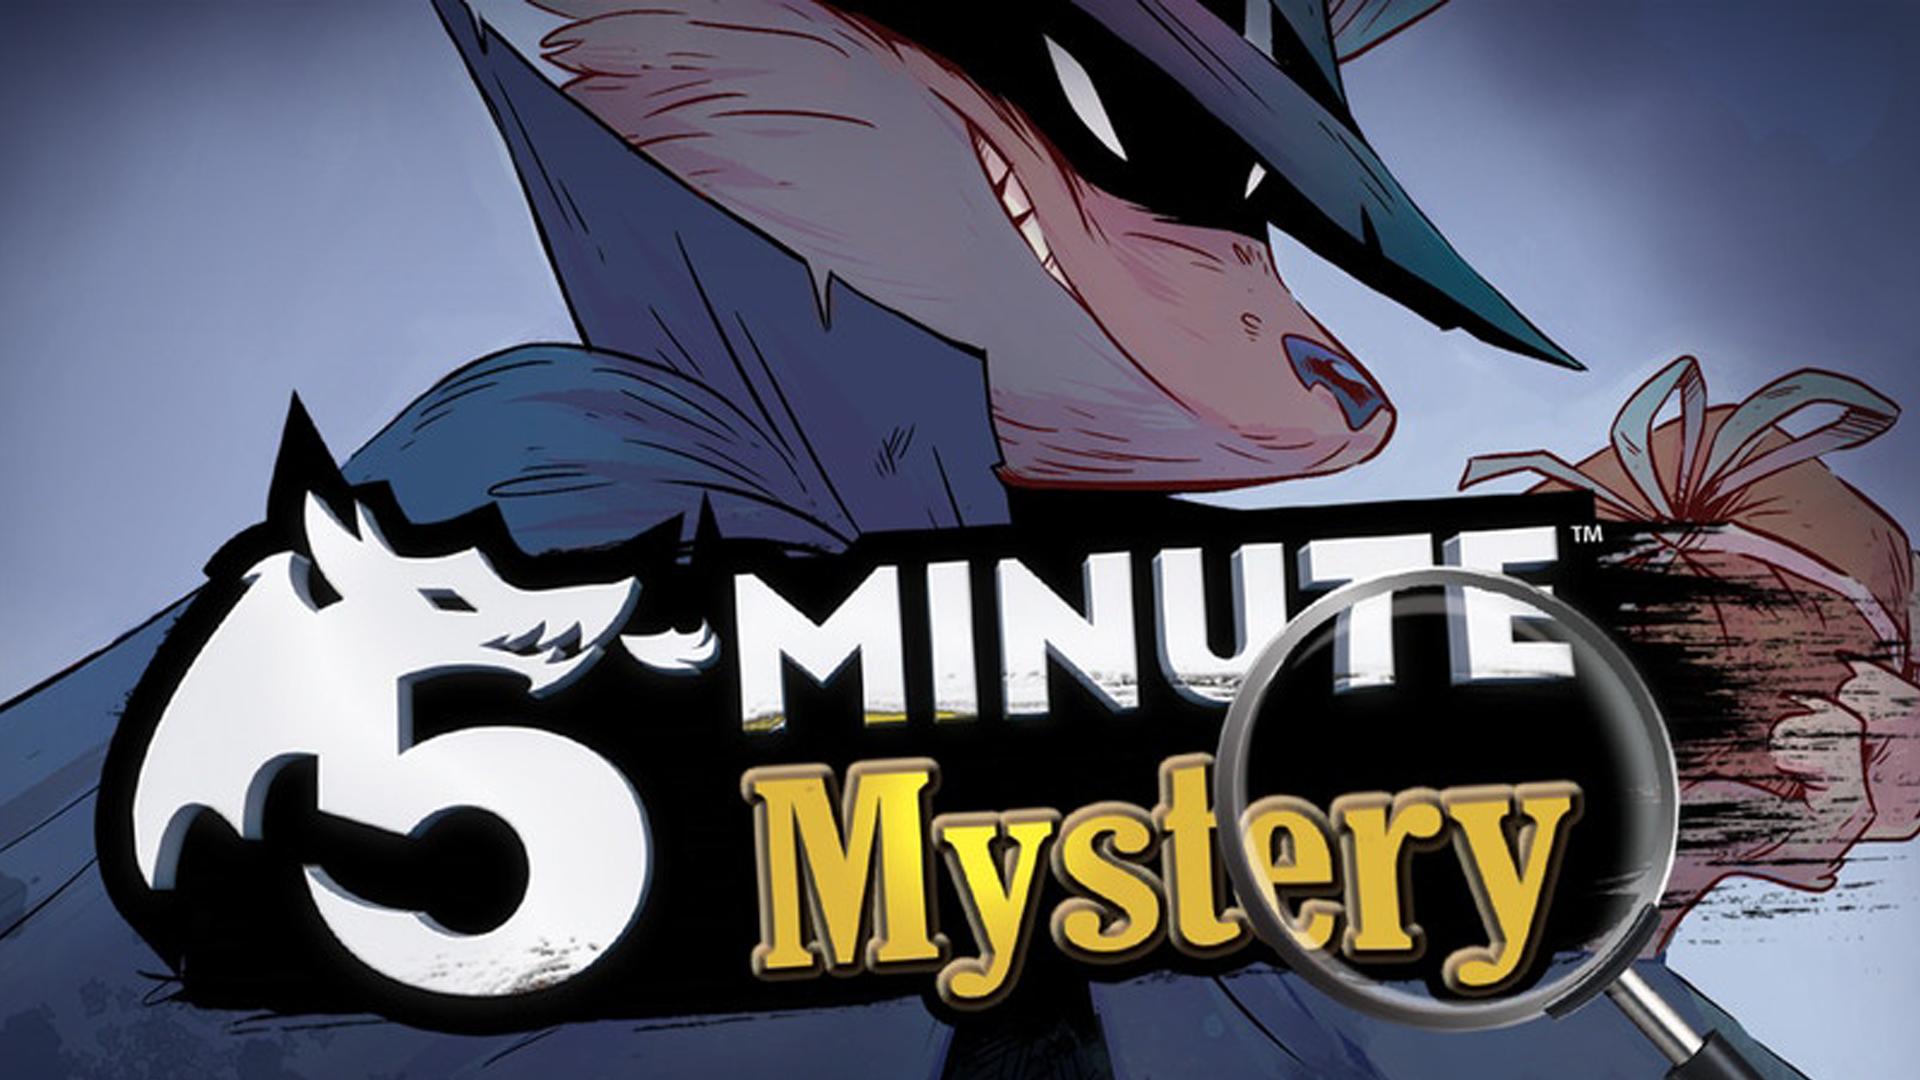 5-Minute Mystery board game artwork